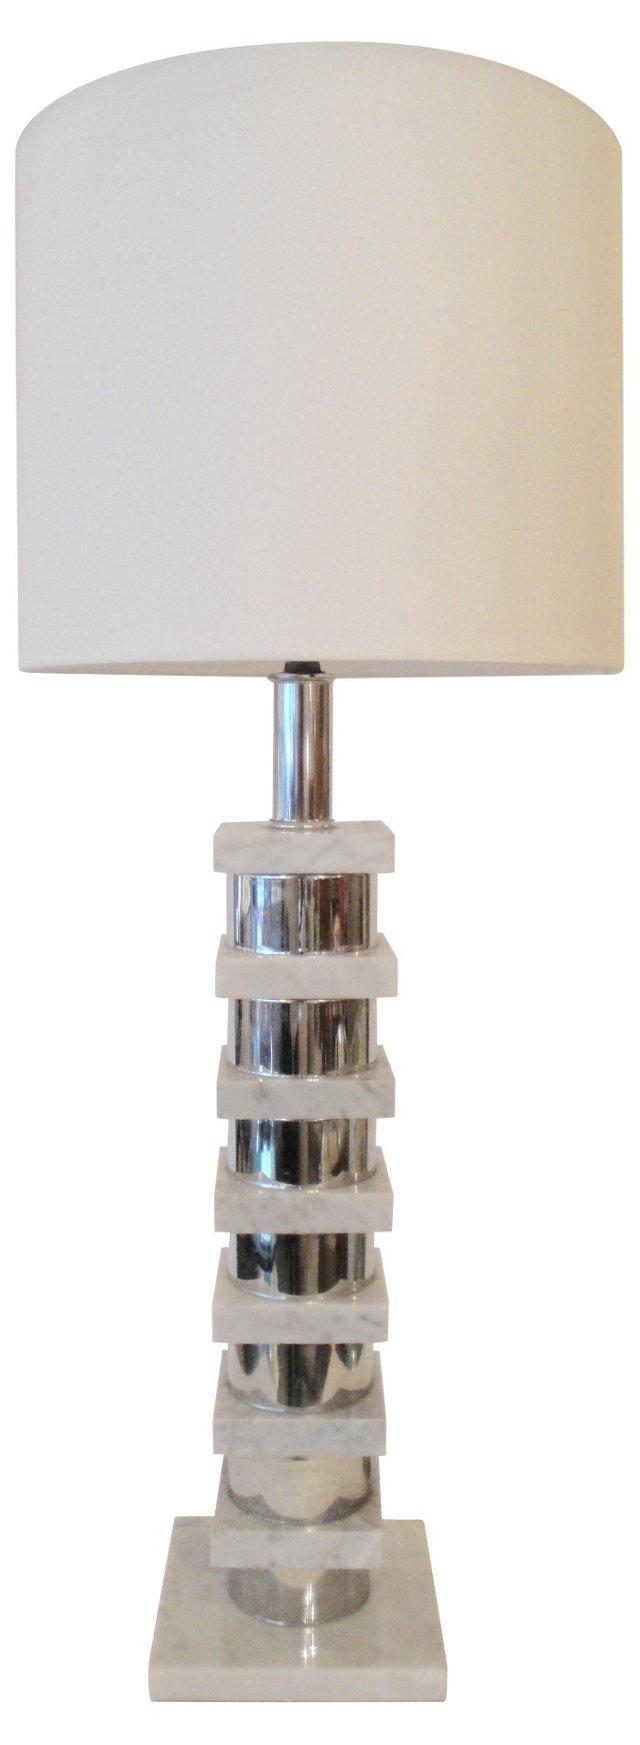 Marble & Chrome Lamp